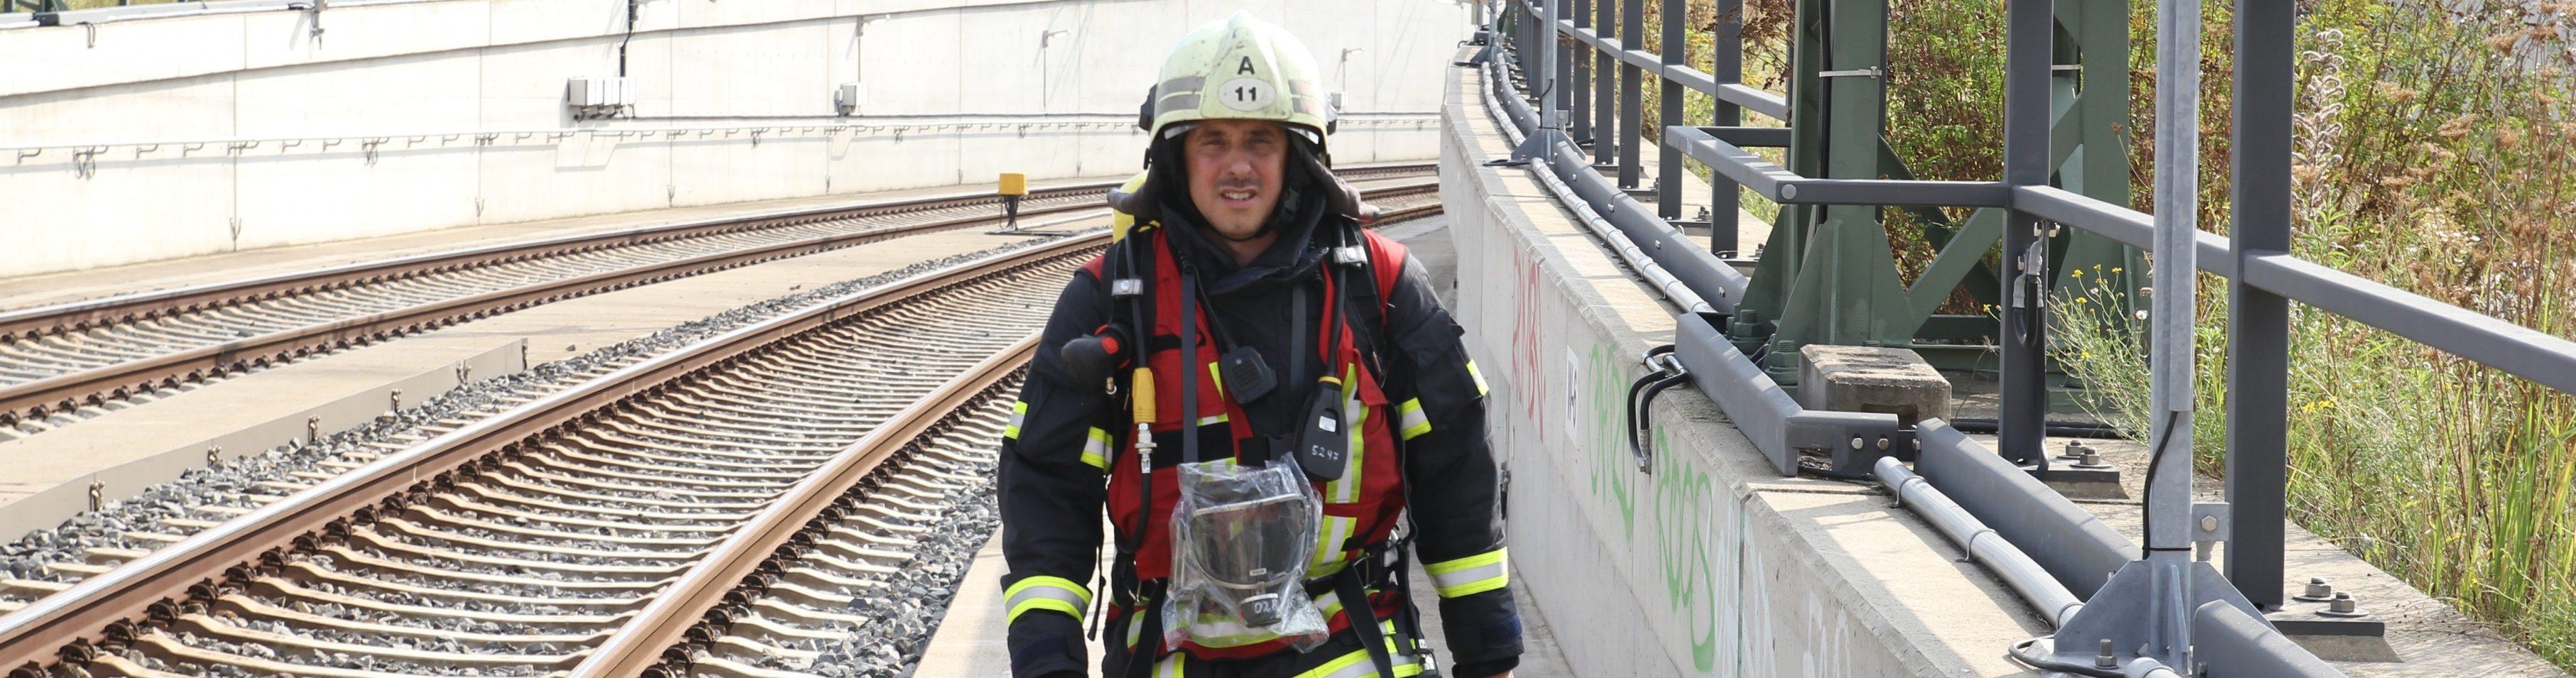 Freiwillige Feuerwehr Leipzig-Plaußig